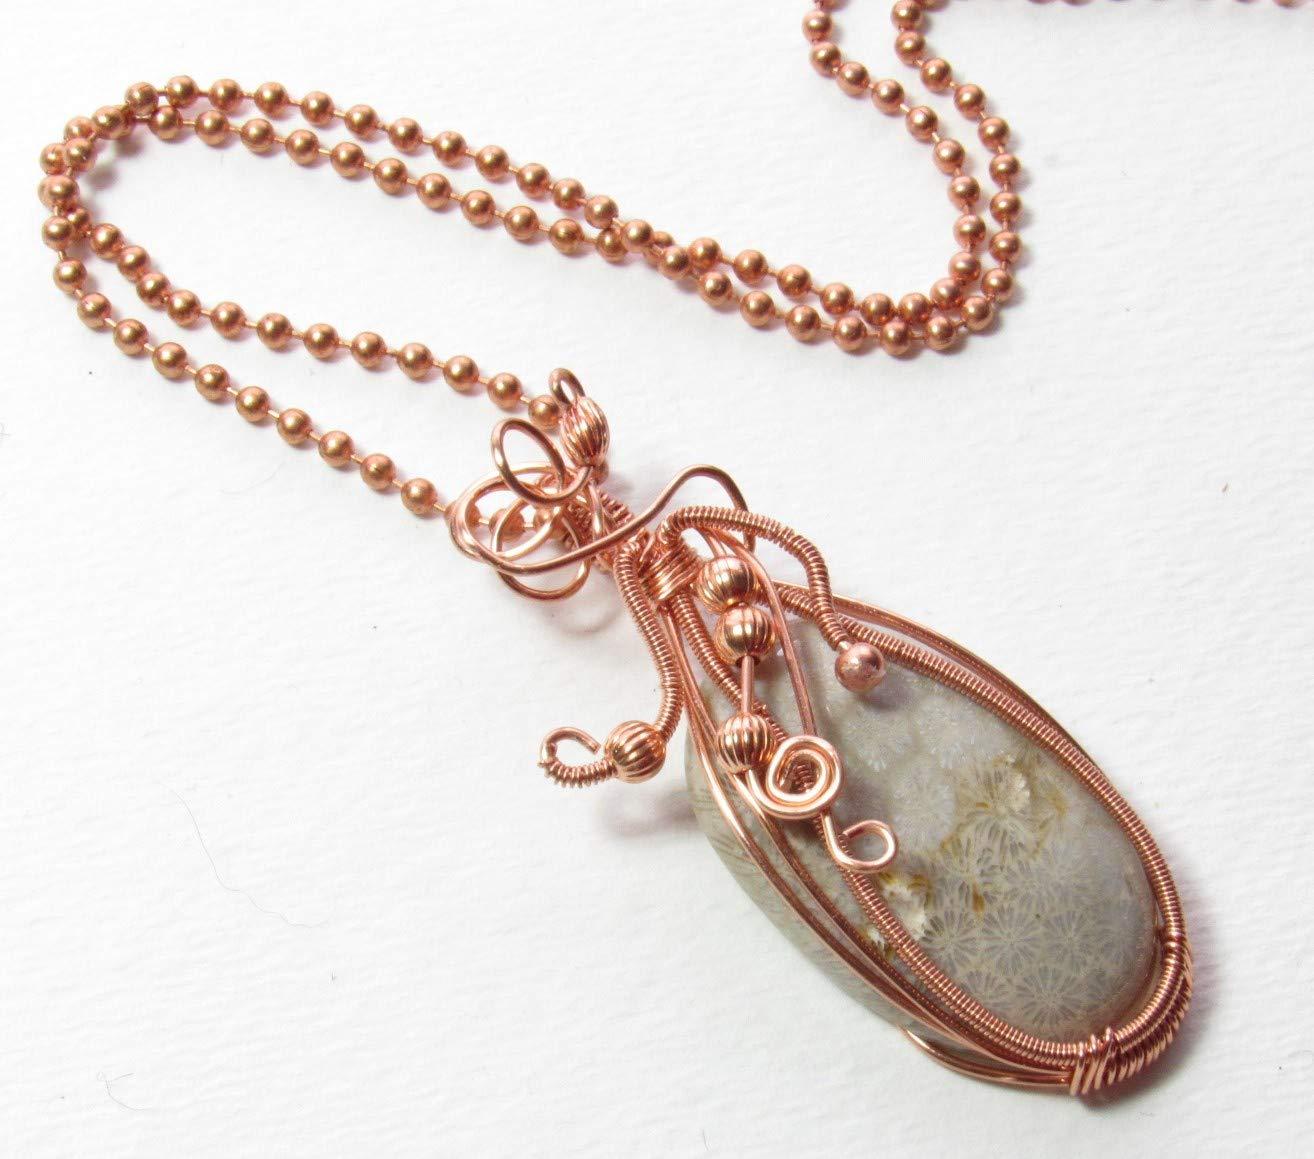 Copper Chain with Tornado Wrapped Calcite Pendant